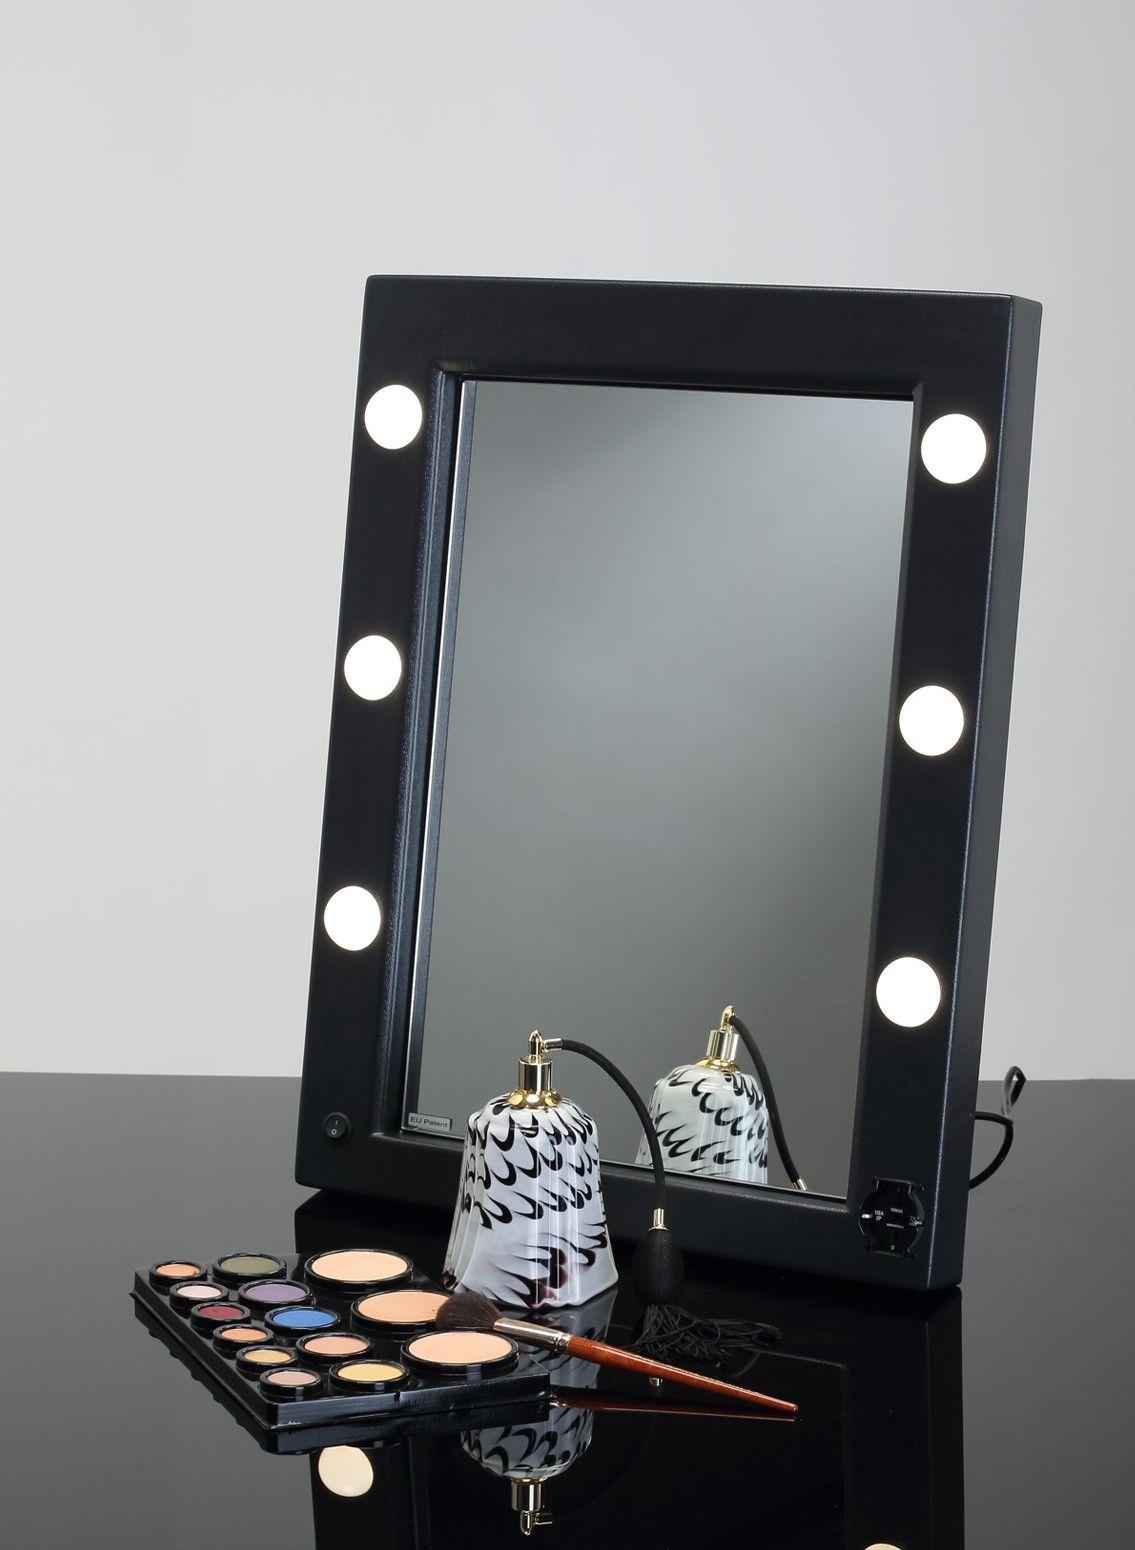 The Original Lighted Makeup Mirror By Makeup Mirror With Lights Makeup Mirror Mirror With Lights